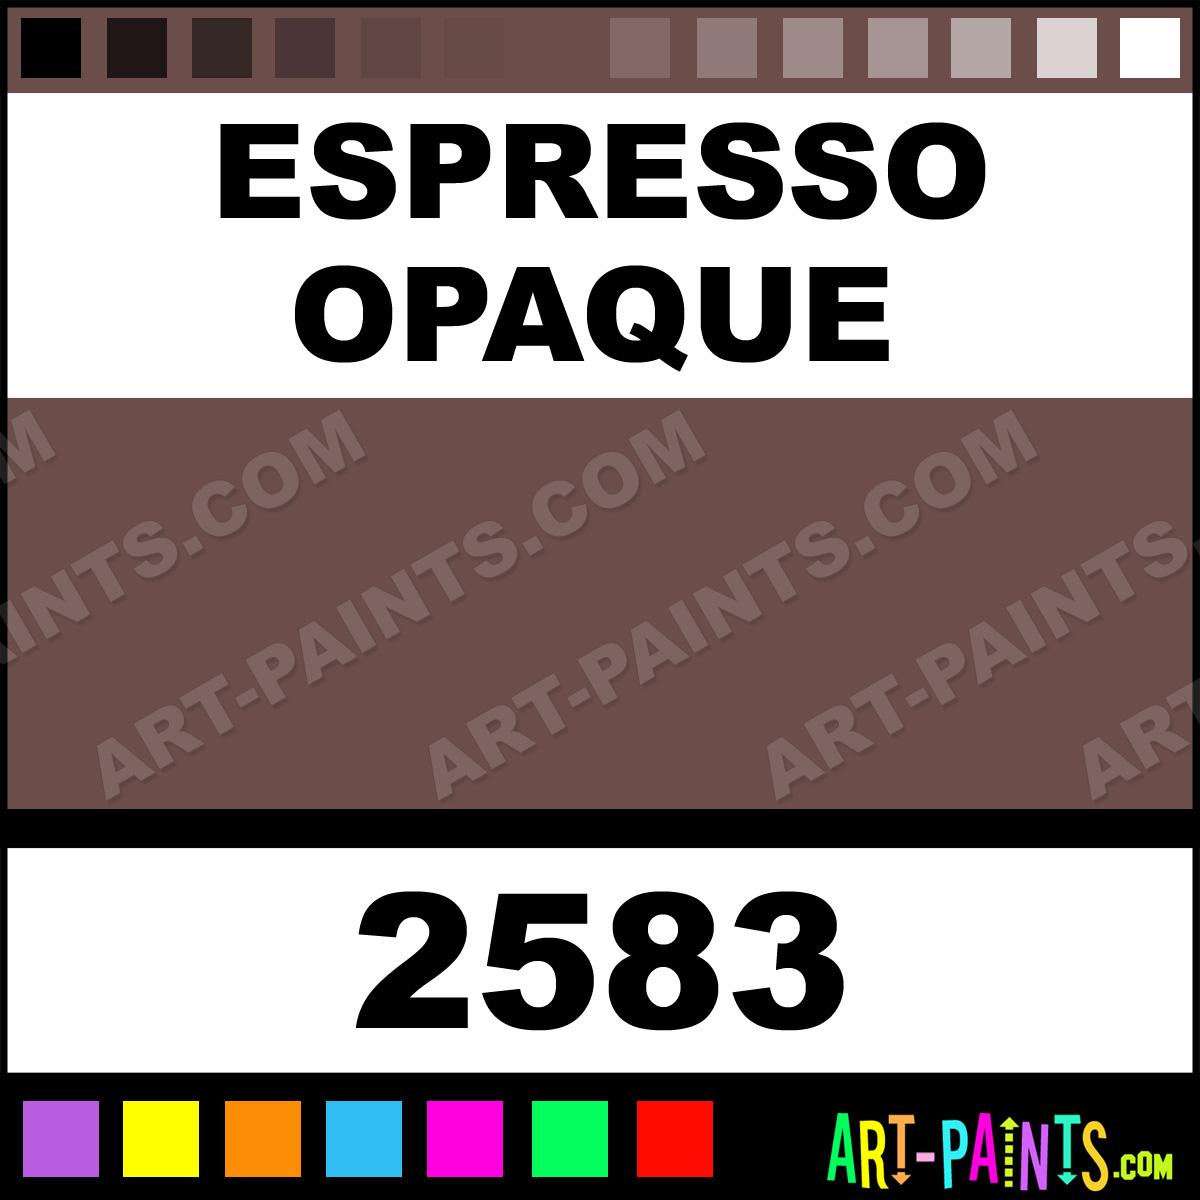 Espresso opaque delta acrylic paints 2583 espresso opaque espresso opaque paint 2583 by ceramcoat delta paints nvjuhfo Choice Image